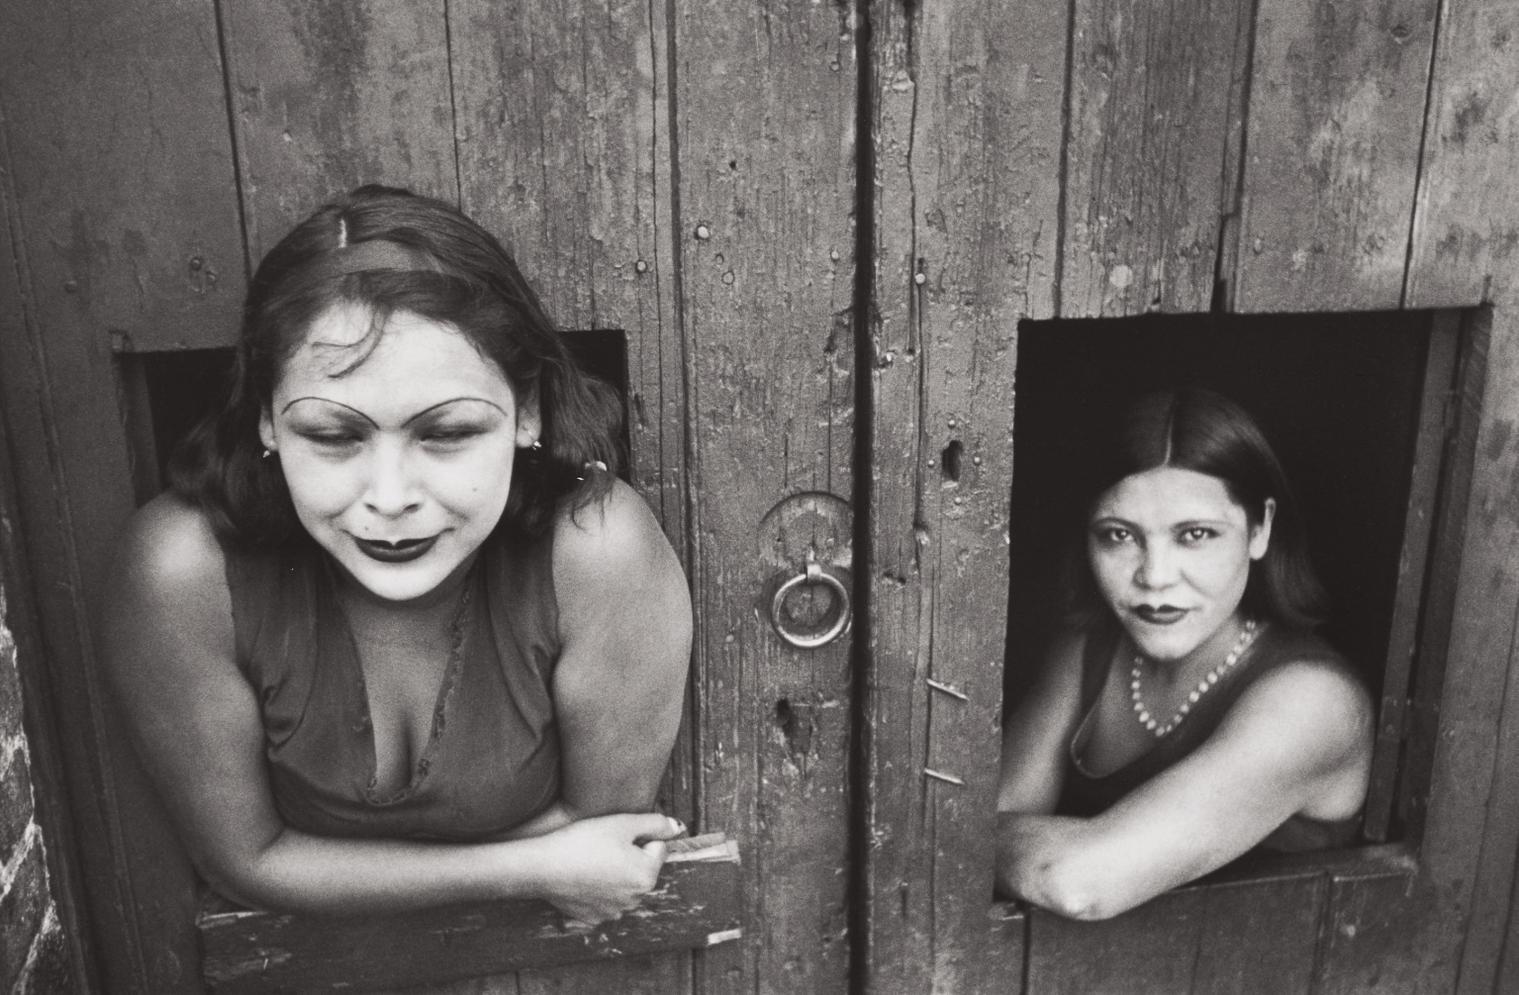 Henri Cartier-Bresson-Calle Cuauhtemoctzin, Mexico City, Mexico-1934